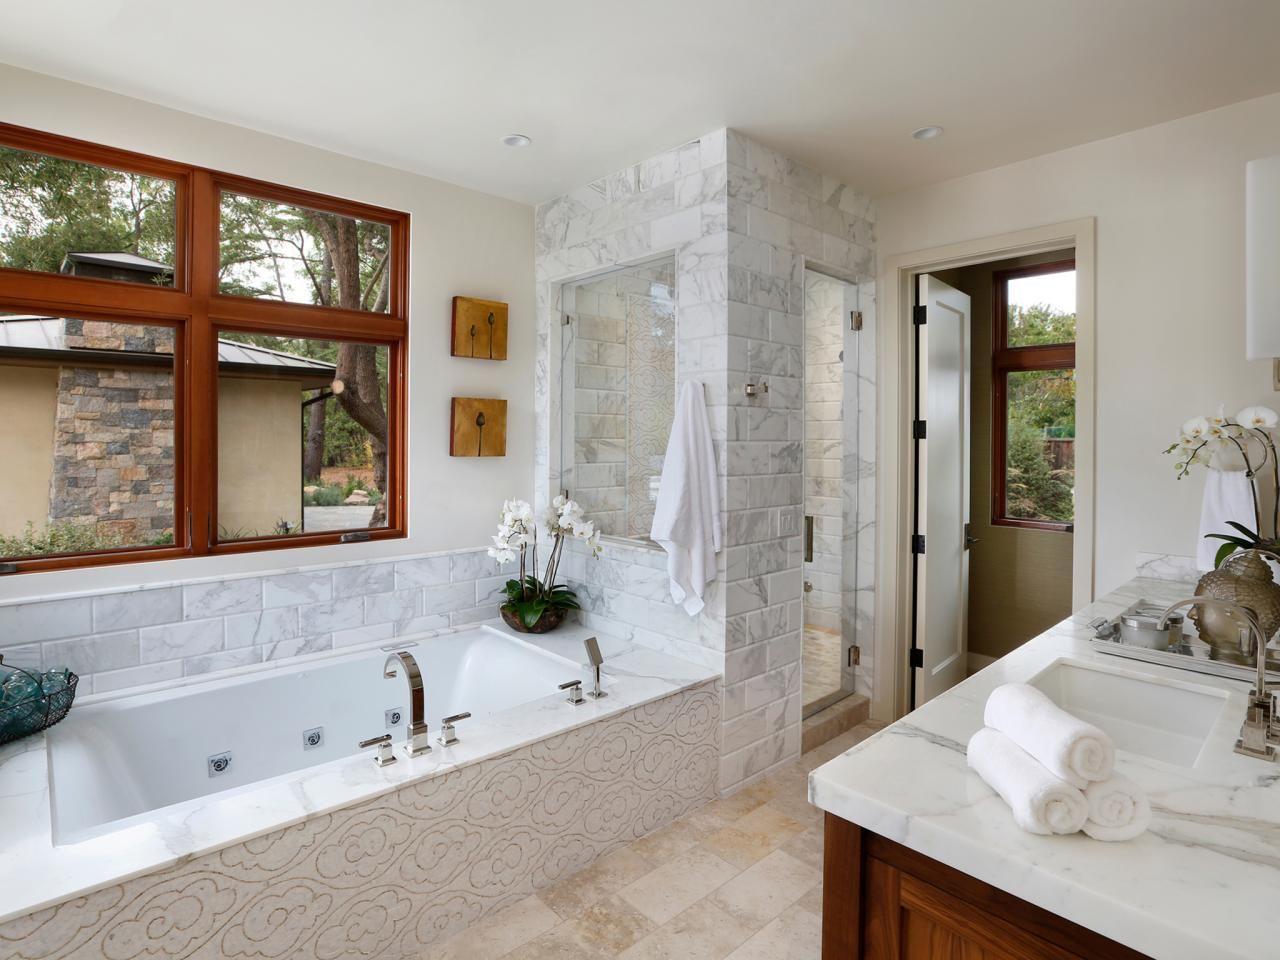 Zen Inspired Bathroom With Decorative Bathtub Zen Bathroom Zen Bathroom Decor Creative Bathroom Design